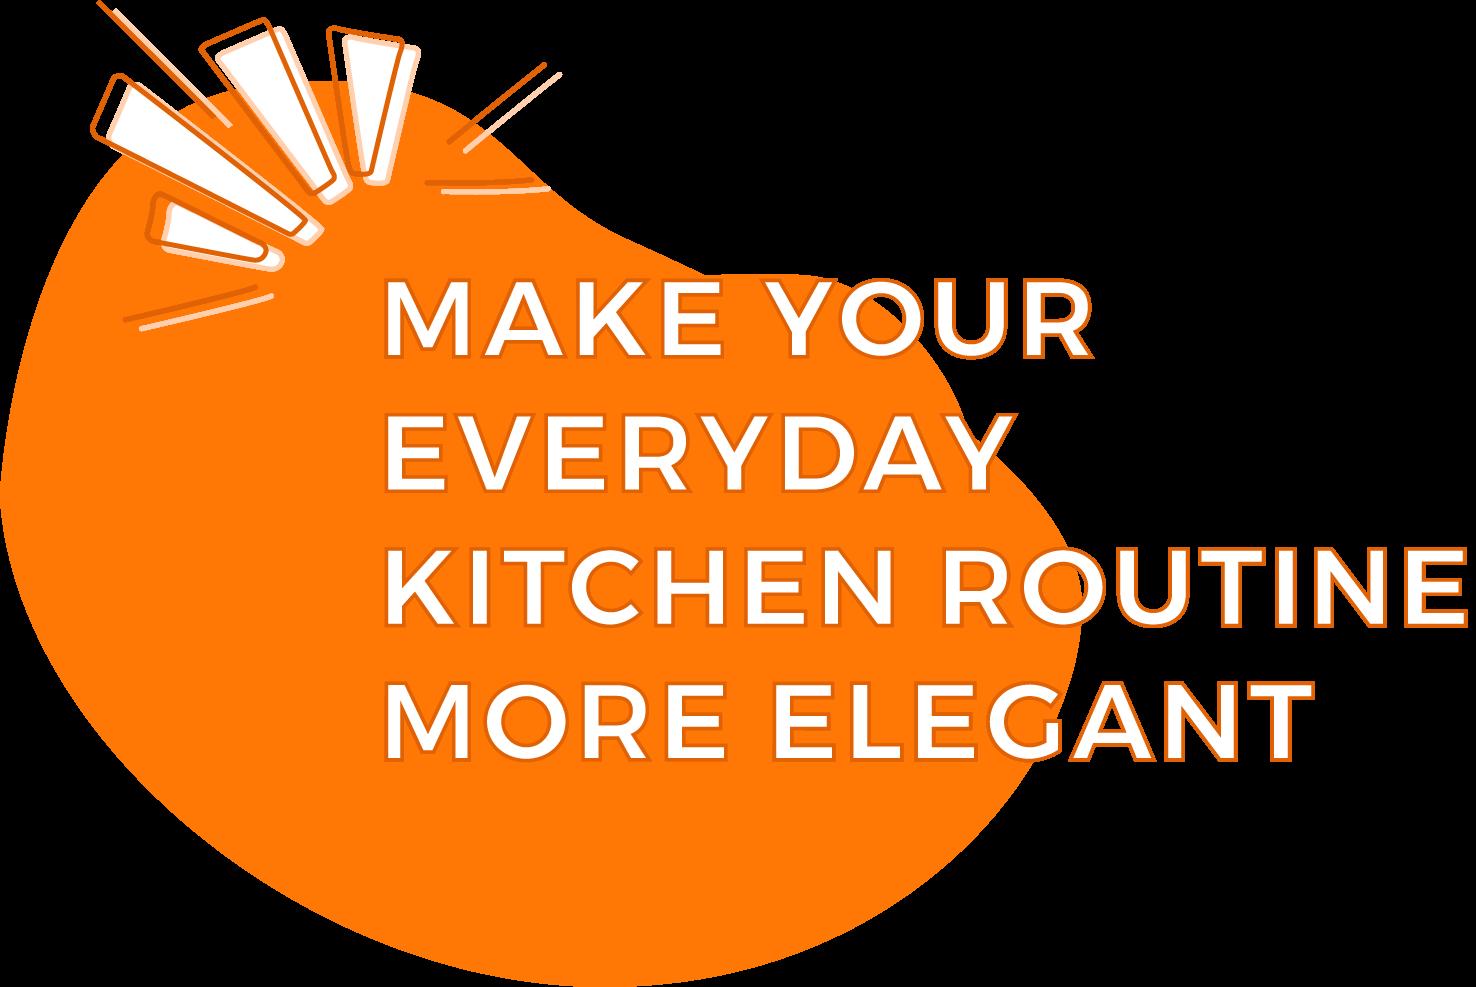 MAKE-YOUR-EVERYDAY-KITCHEN